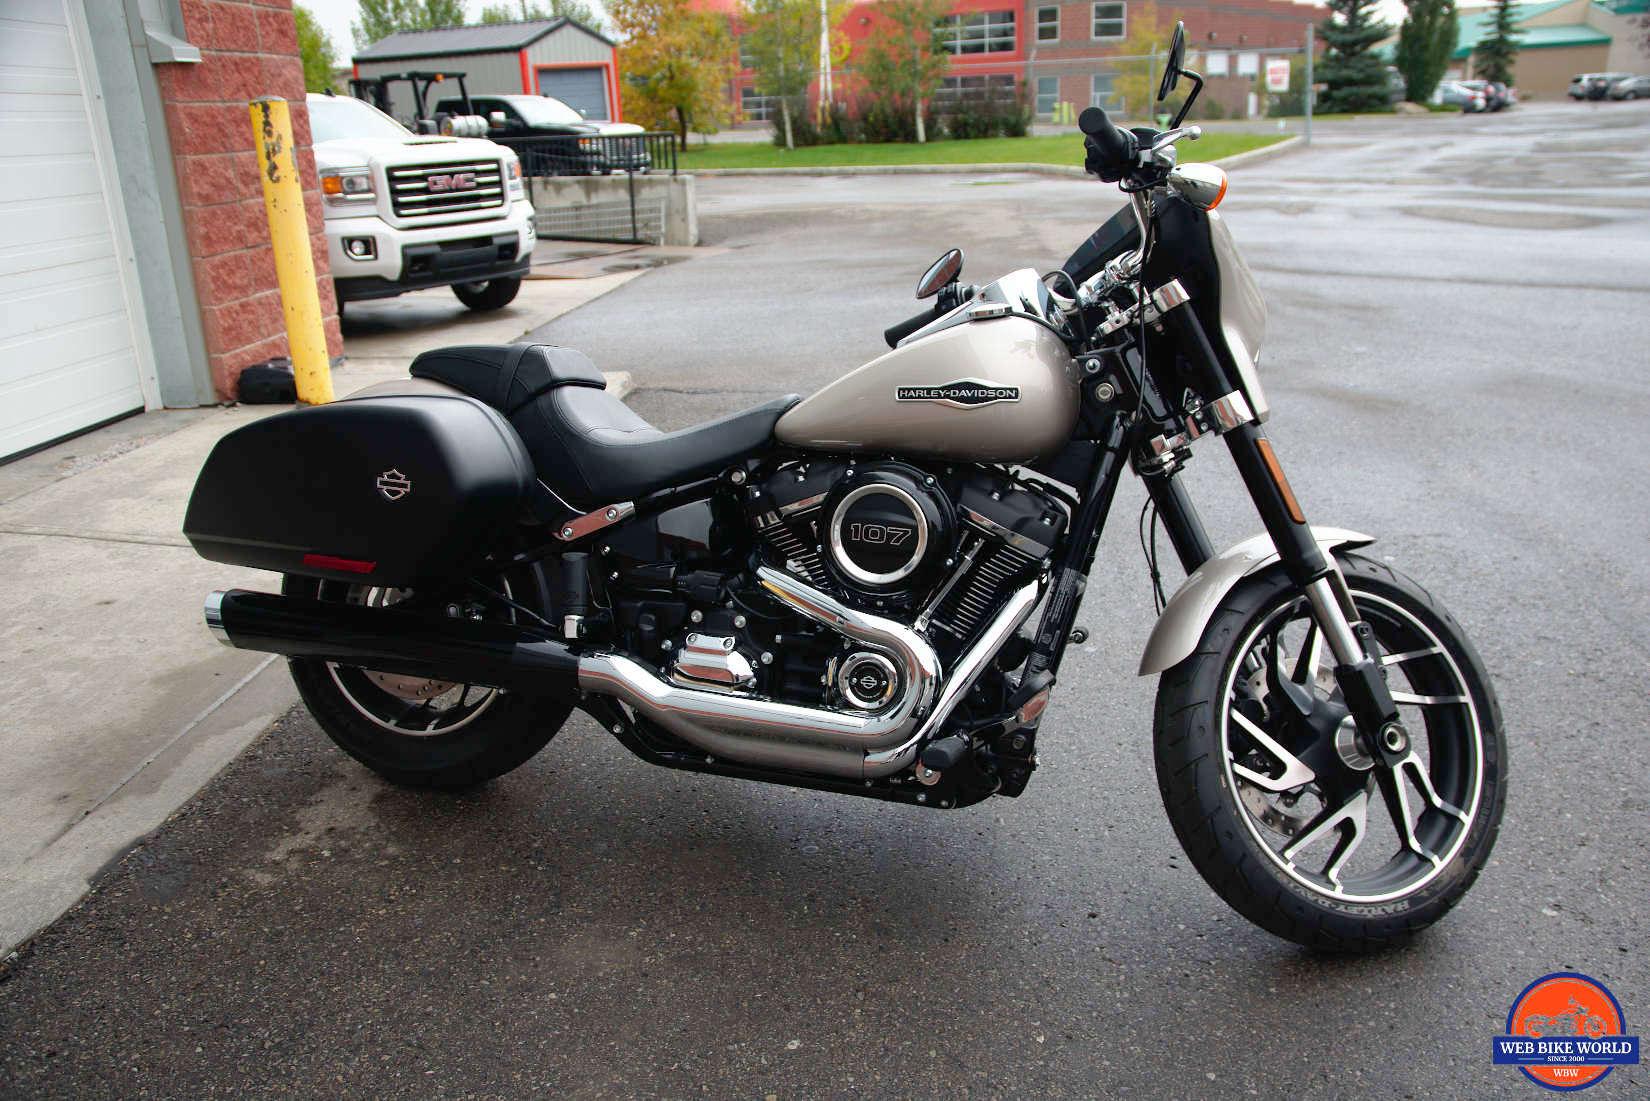 2018 Harley Davidson Sport Glide Test Ride